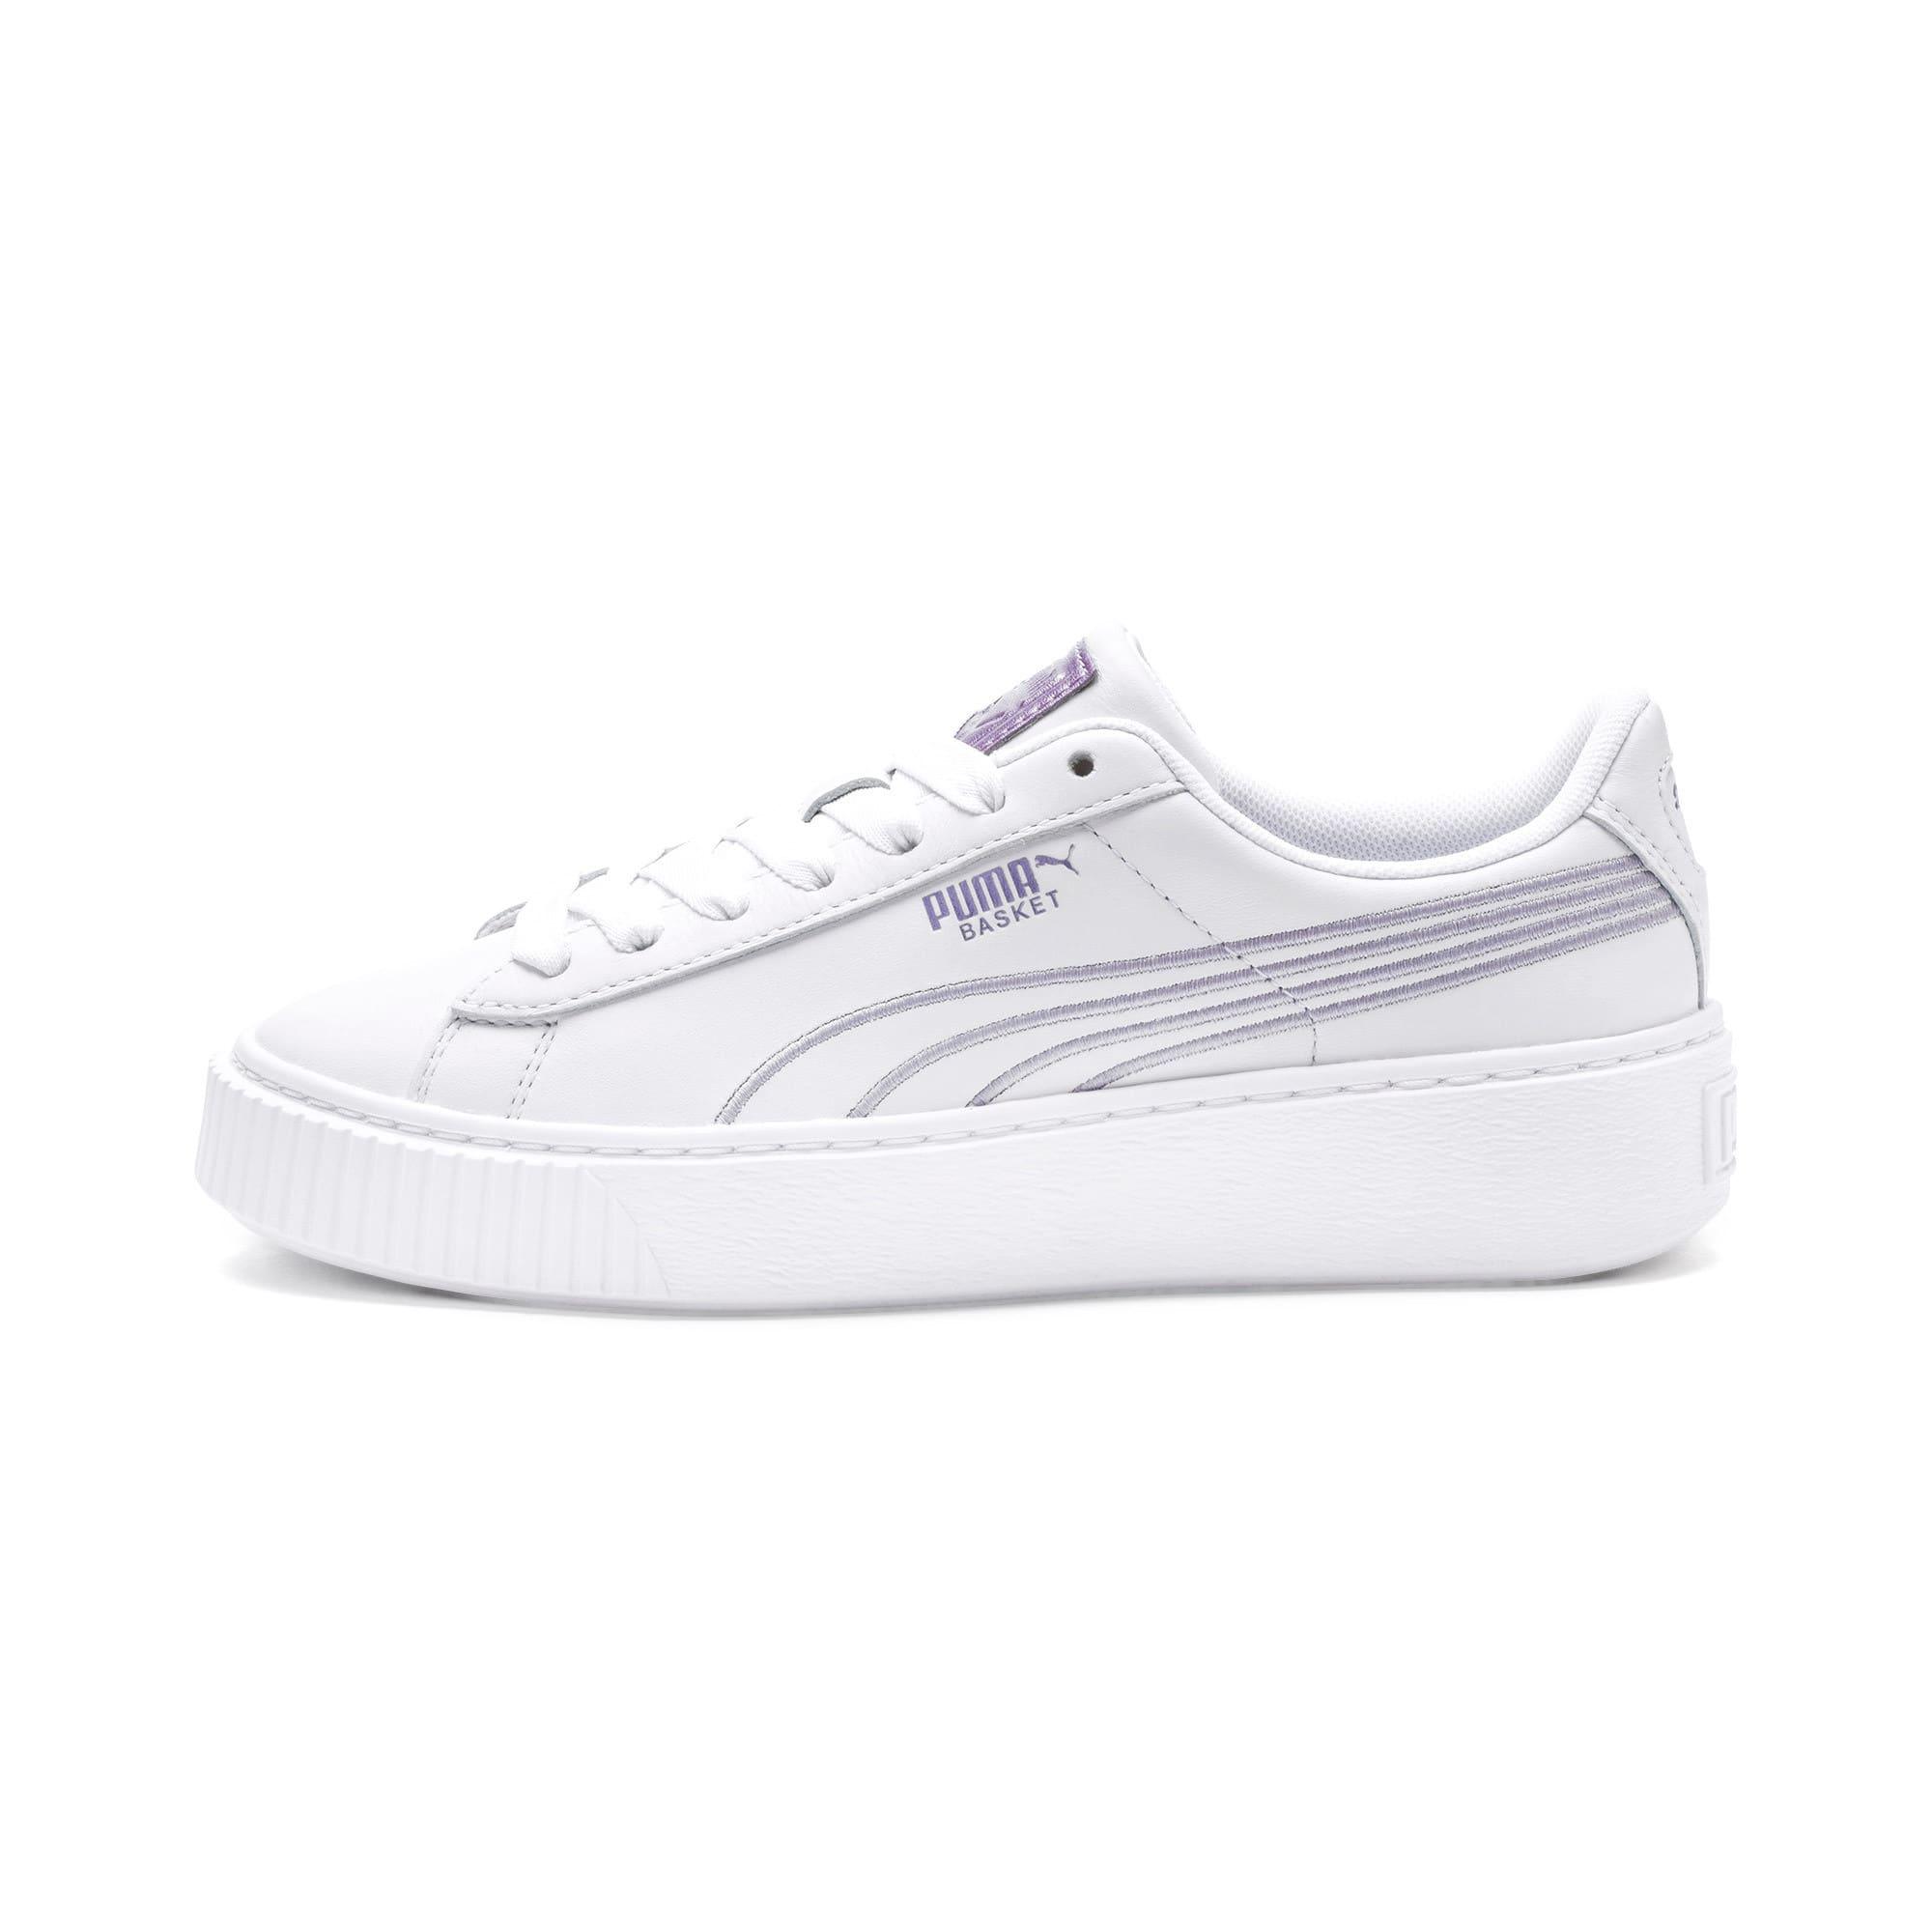 huge discount 2b2f4 043e8 Basket Platform Twilight Women's Sneakers